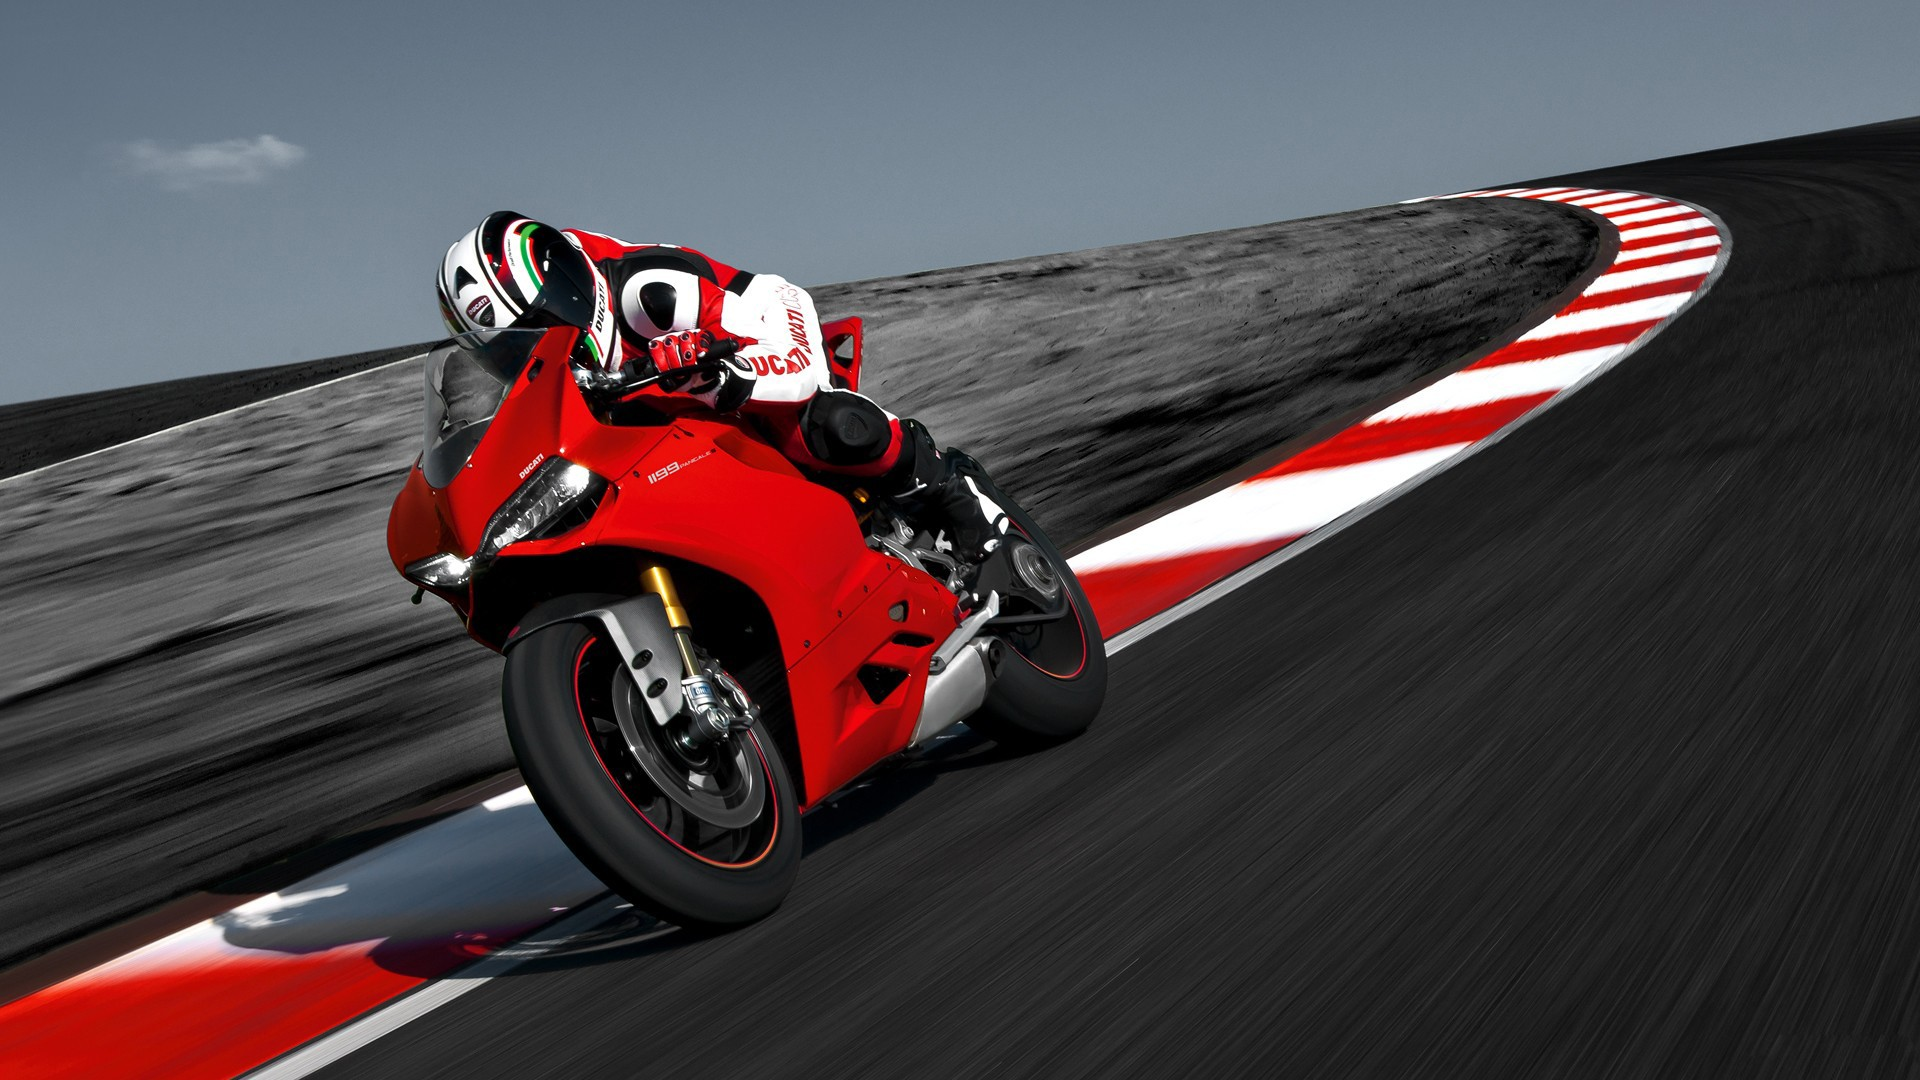 Ducati Wallpaper #9